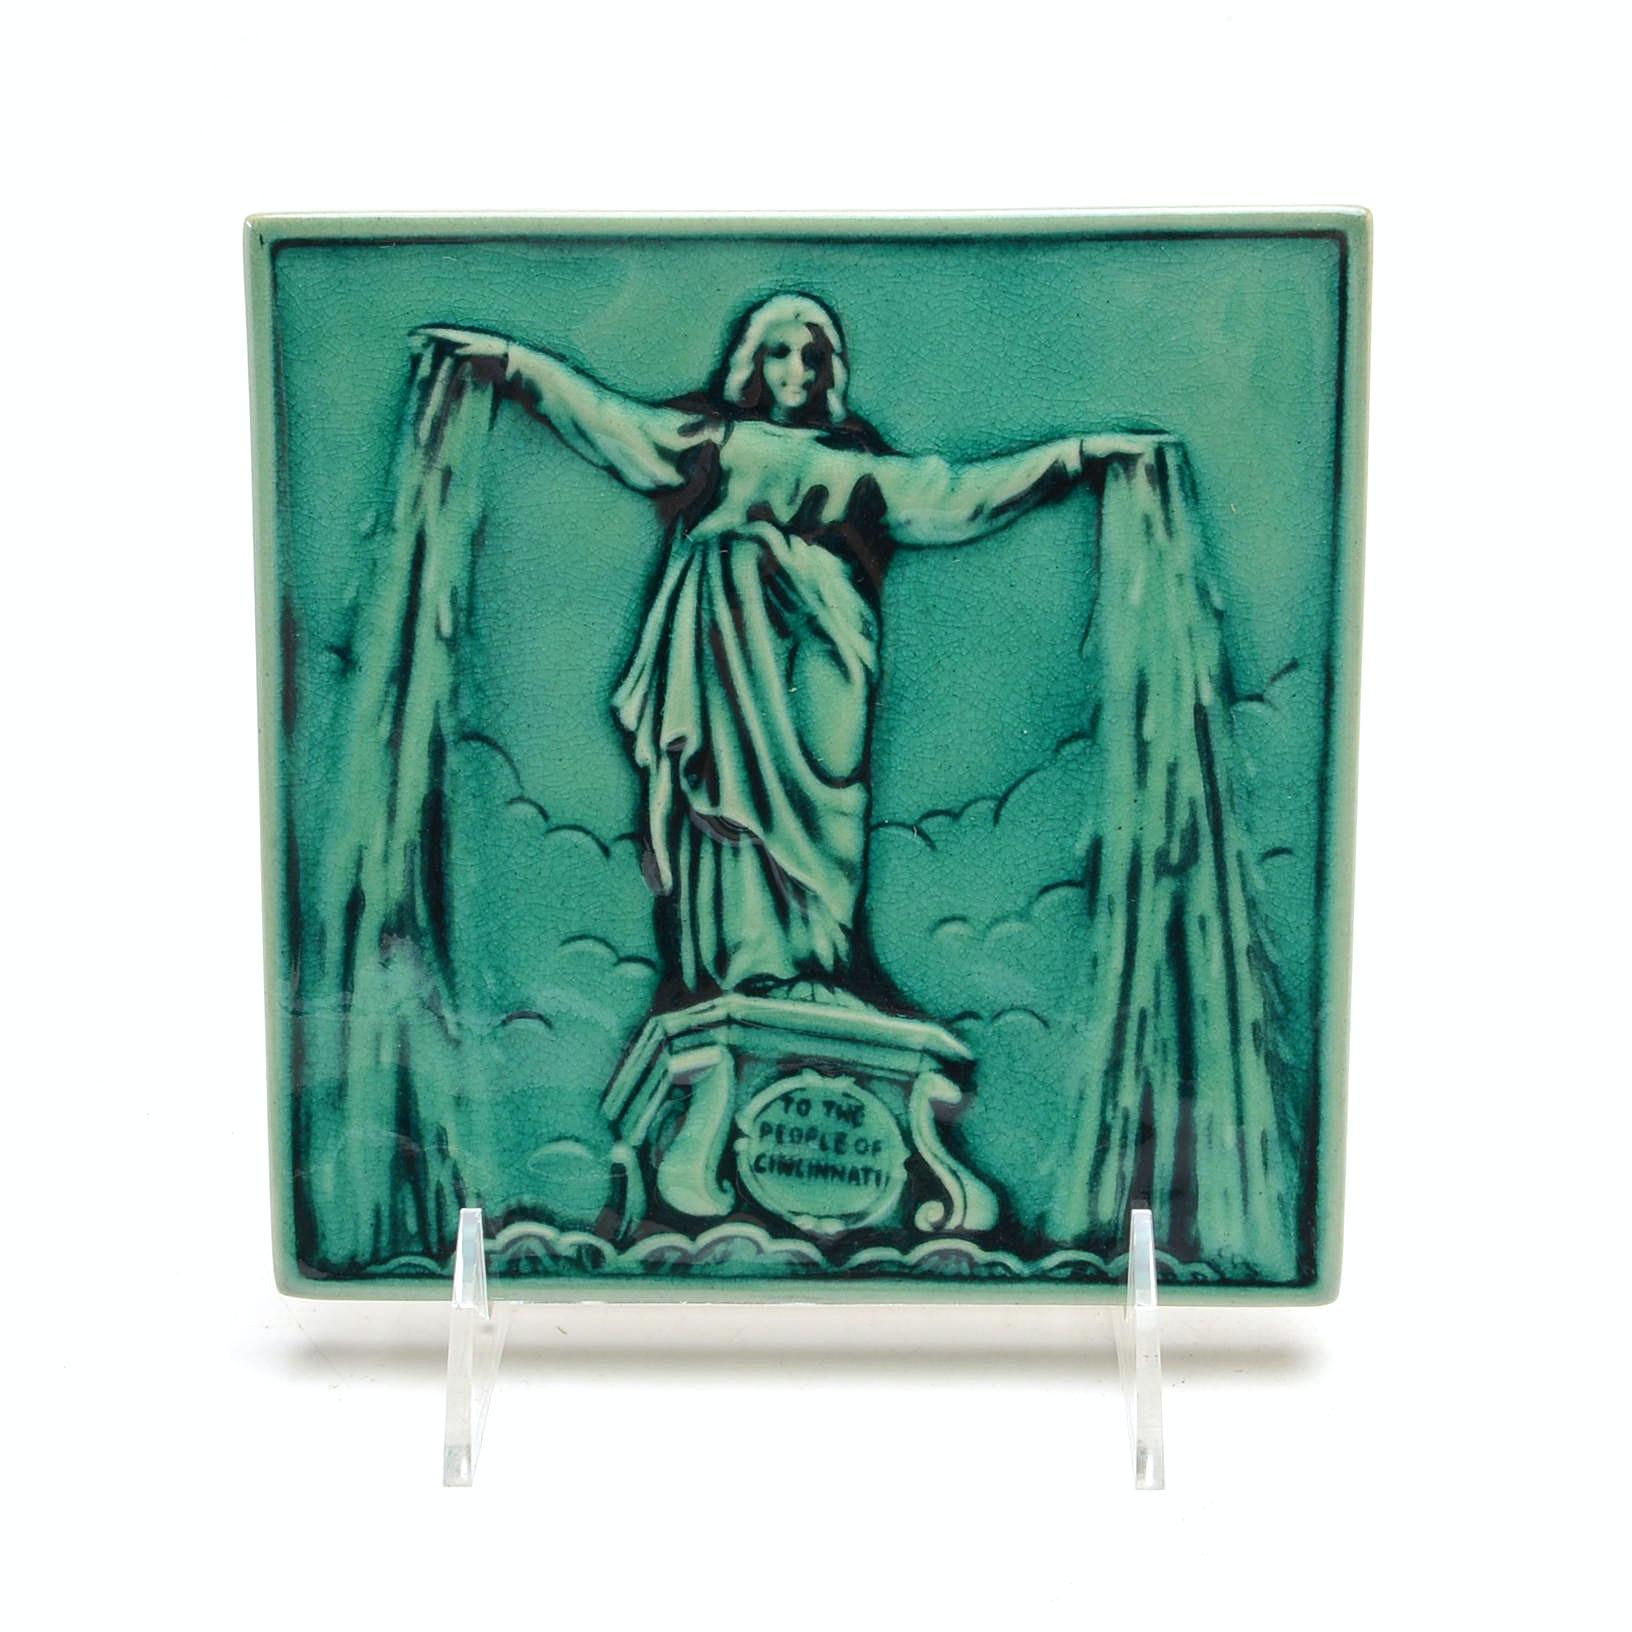 Rookwood Art Pottery Cincinnati Emerald Isle Fountain Square Tile